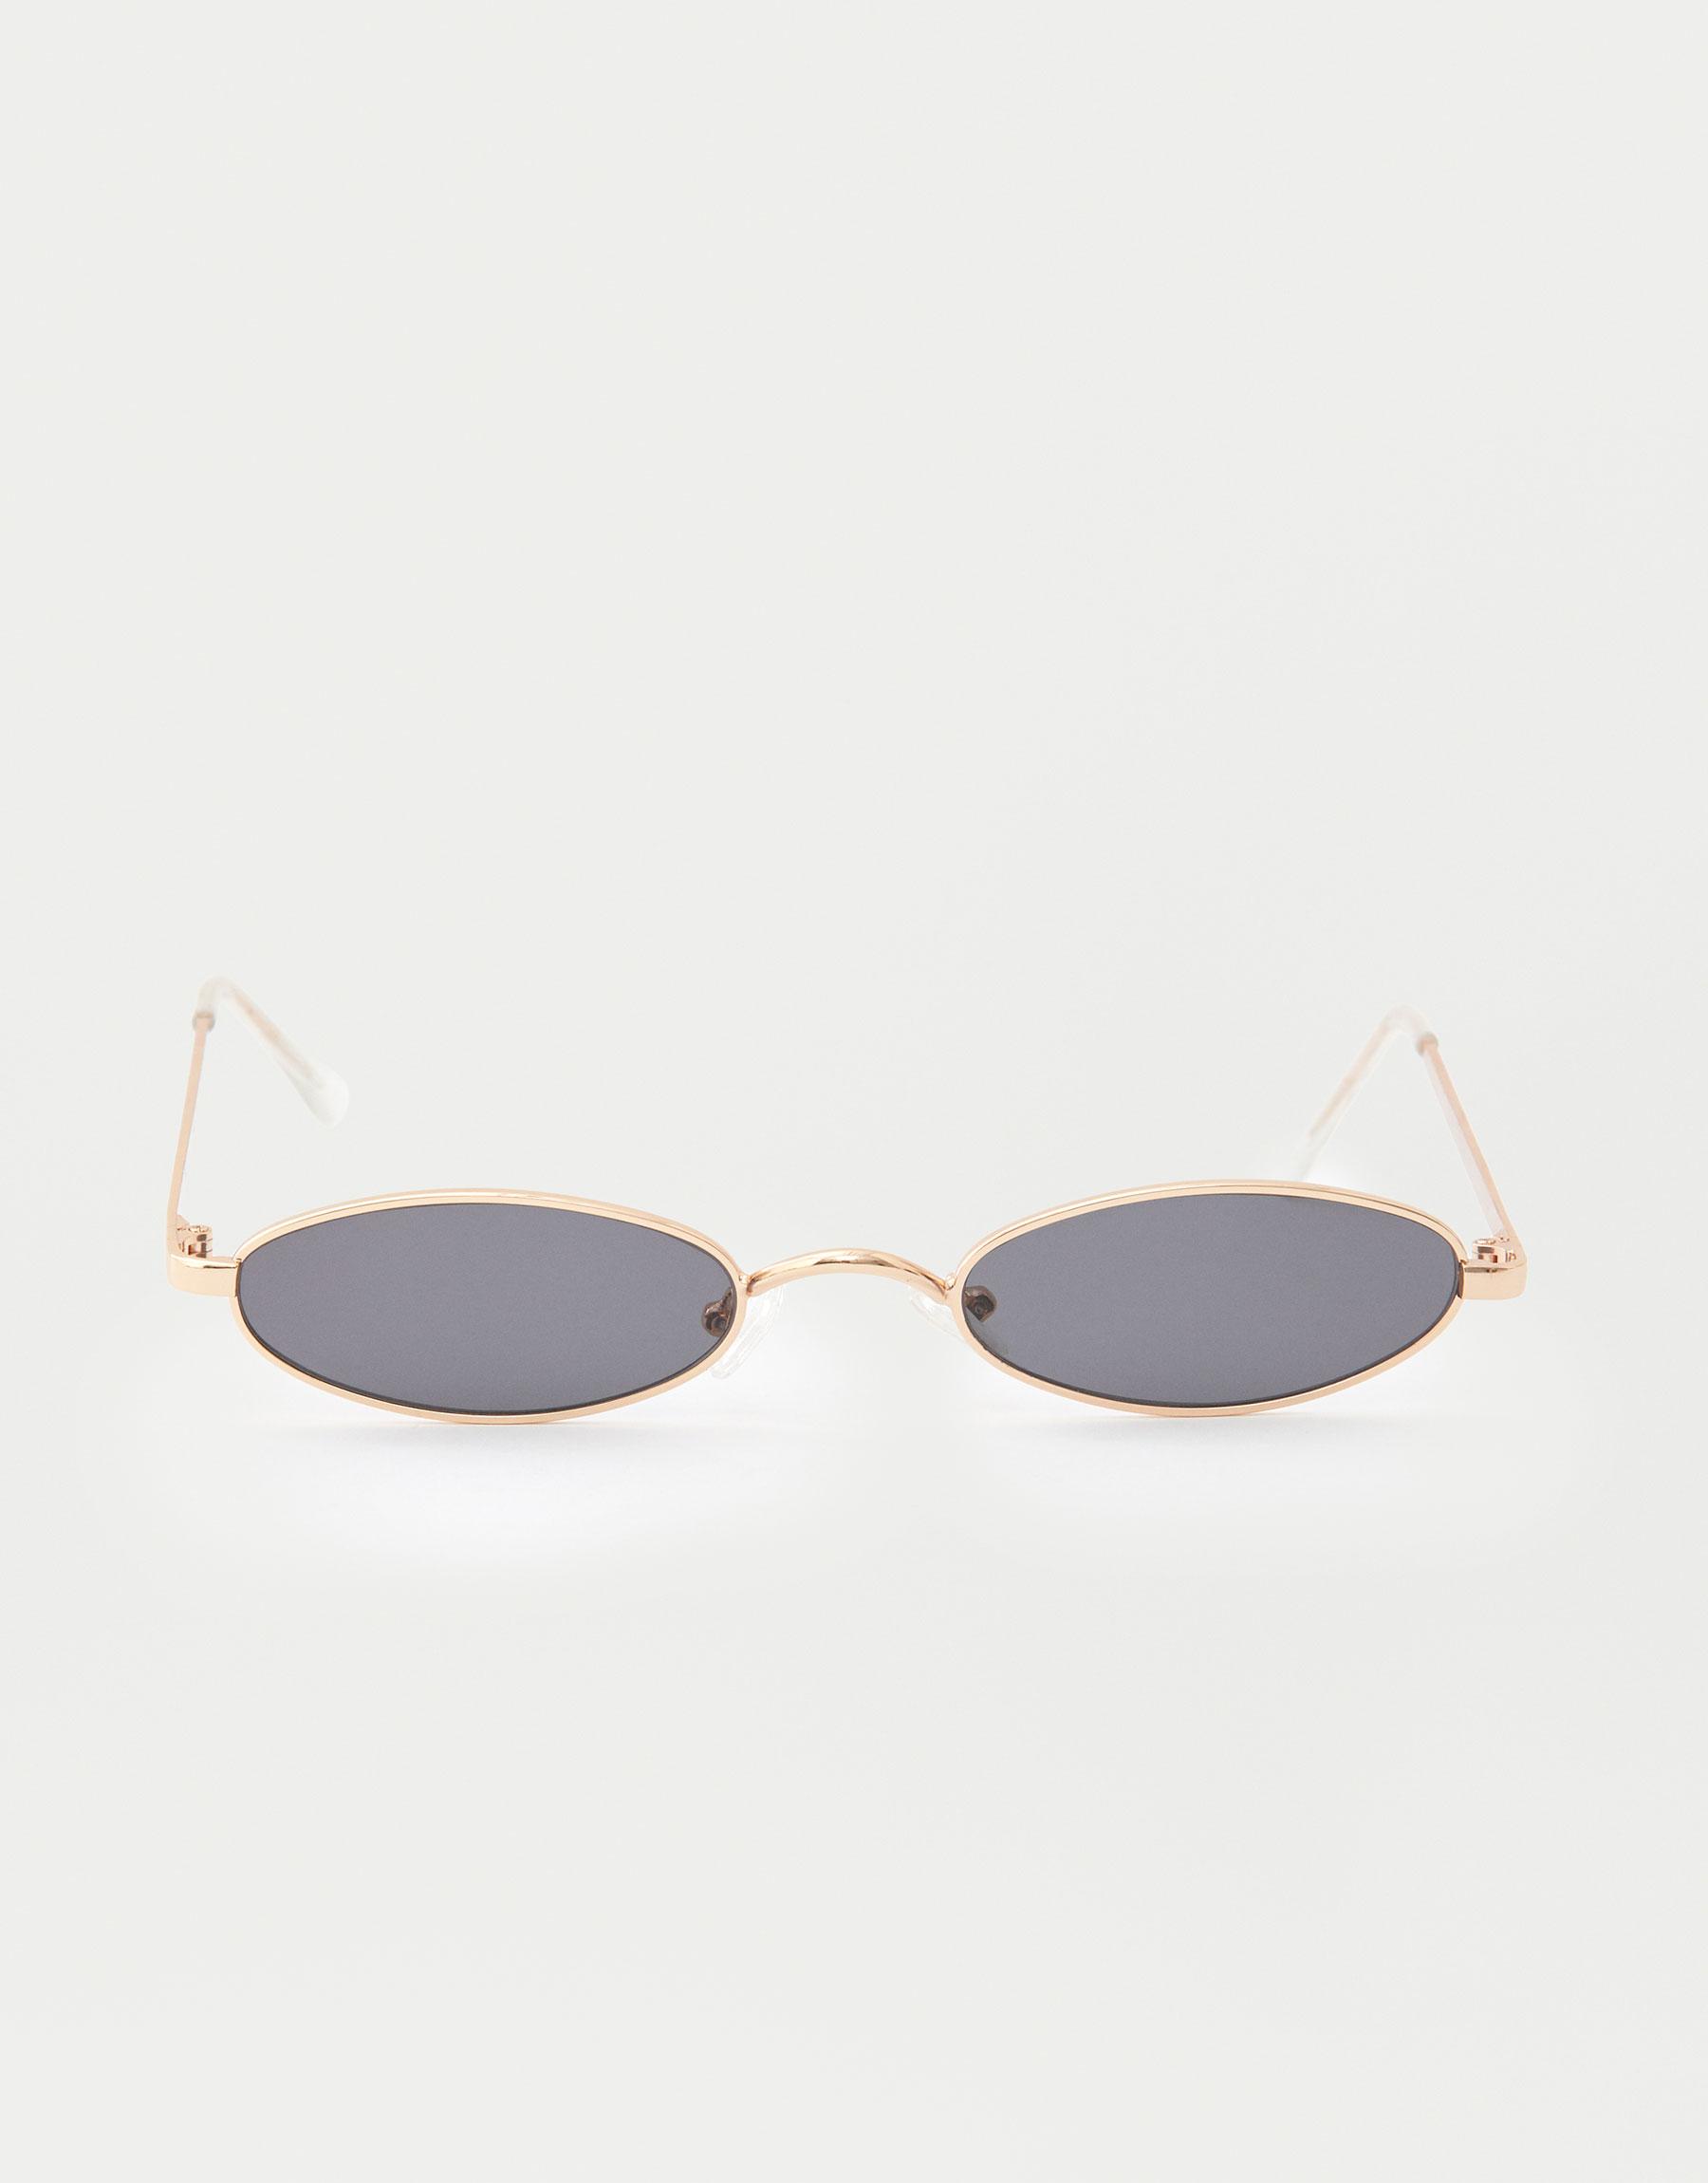 d53603f73de7 Modalite - Pullbear Small cat eye sunglasses